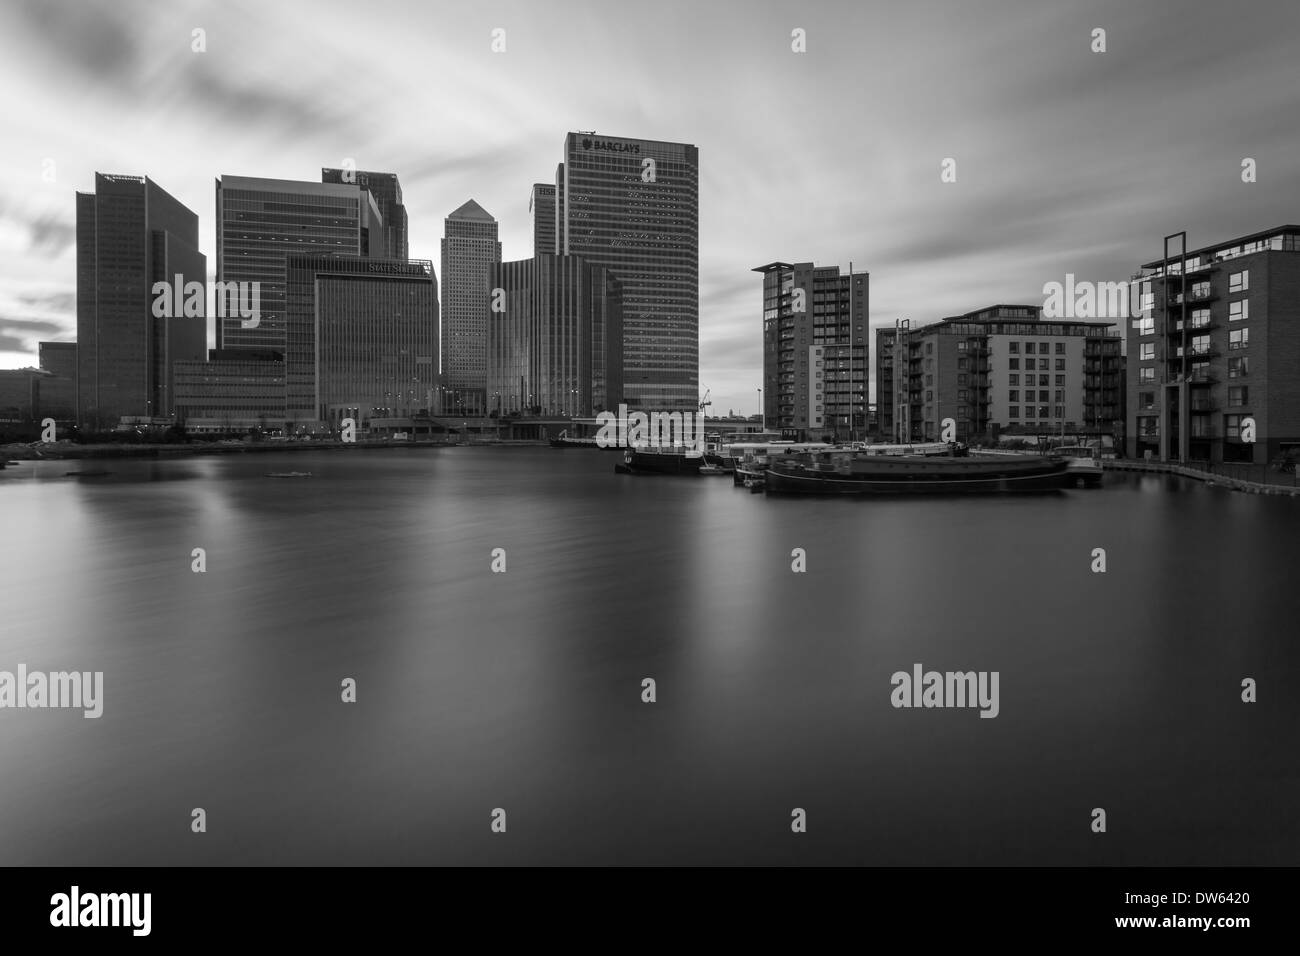 Sunset at Canary Wharf, London, England. - Stock Image